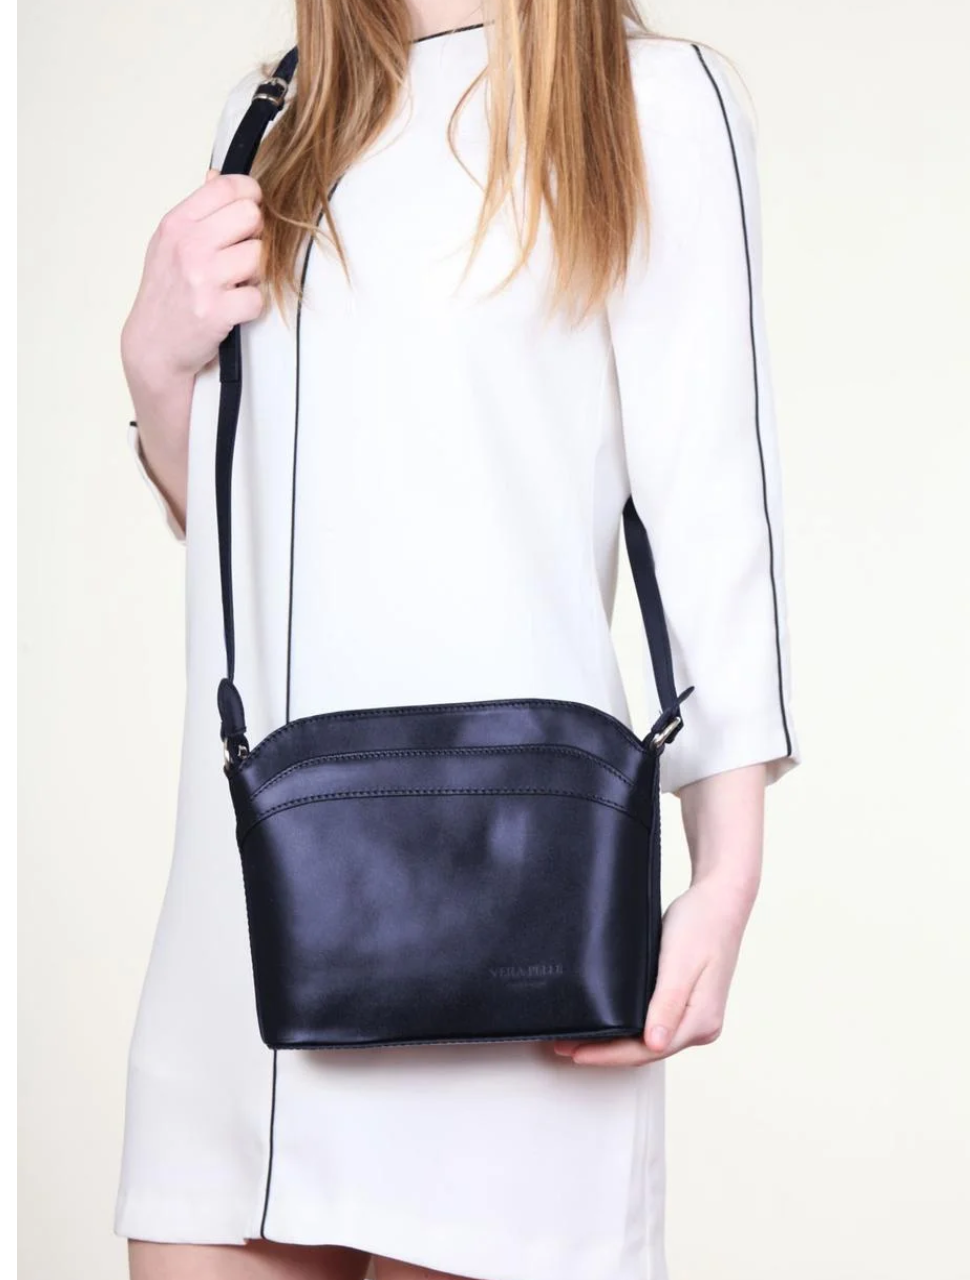 Итальянская Женская черная кожаная сумка 24х20х7